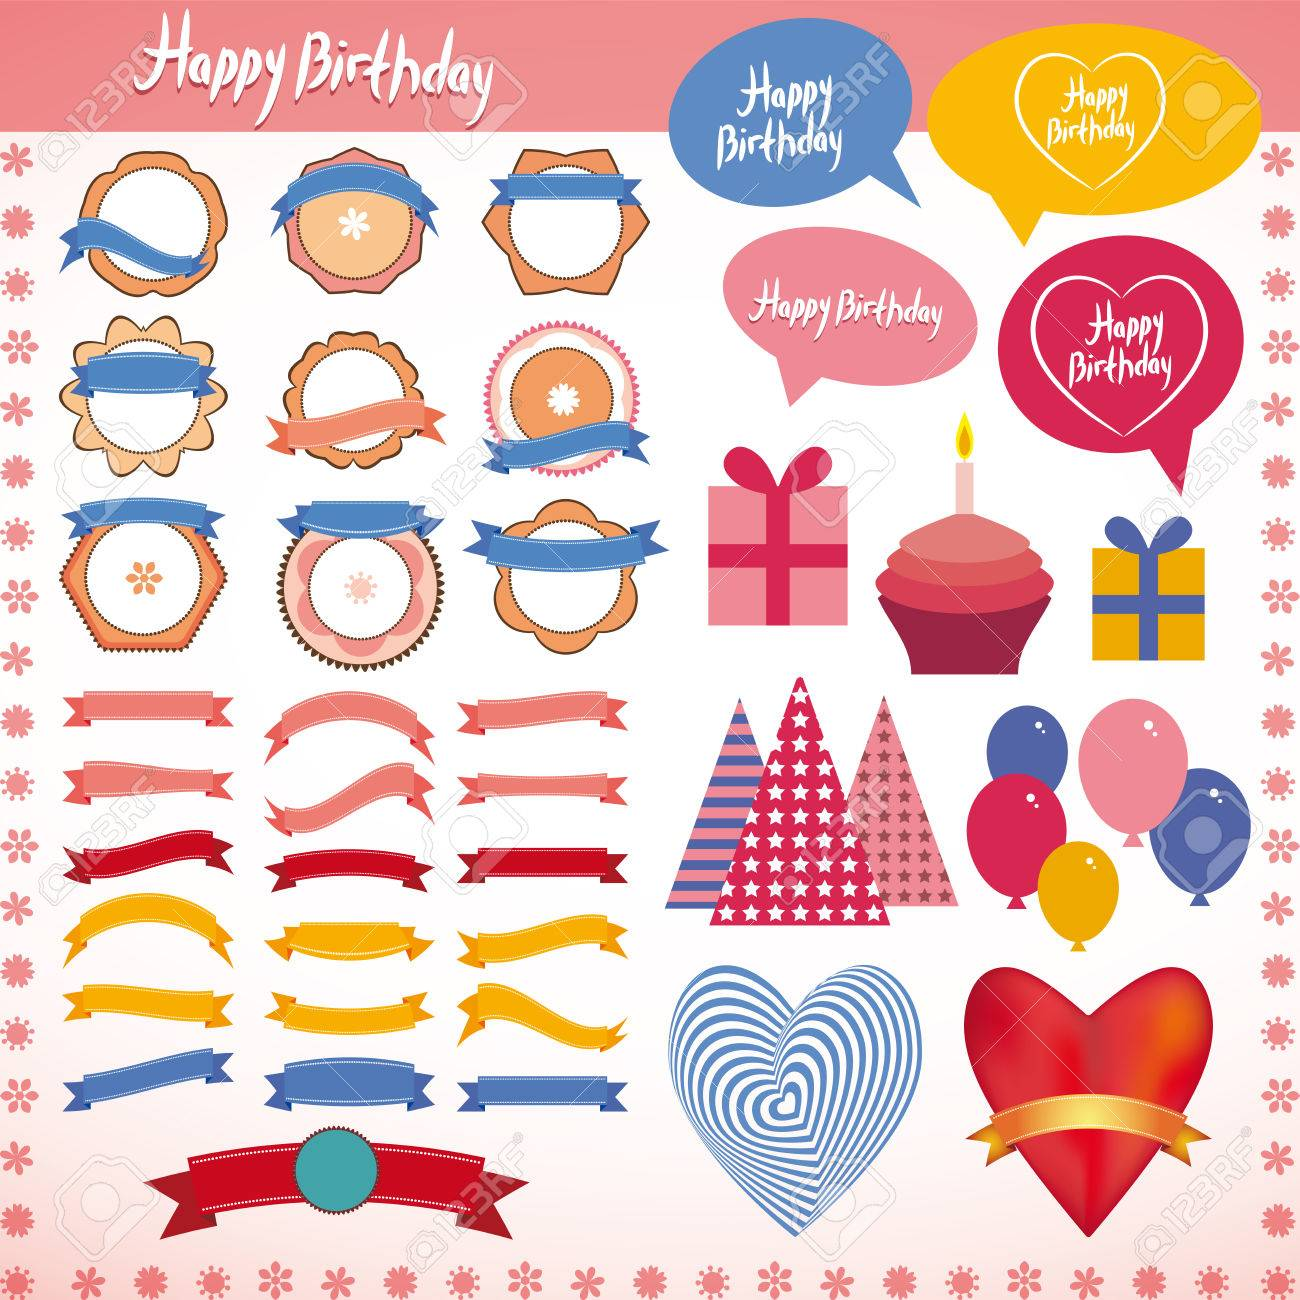 Set of vintage elements, birthday holiday party Pink, blue, orange. - 34220252